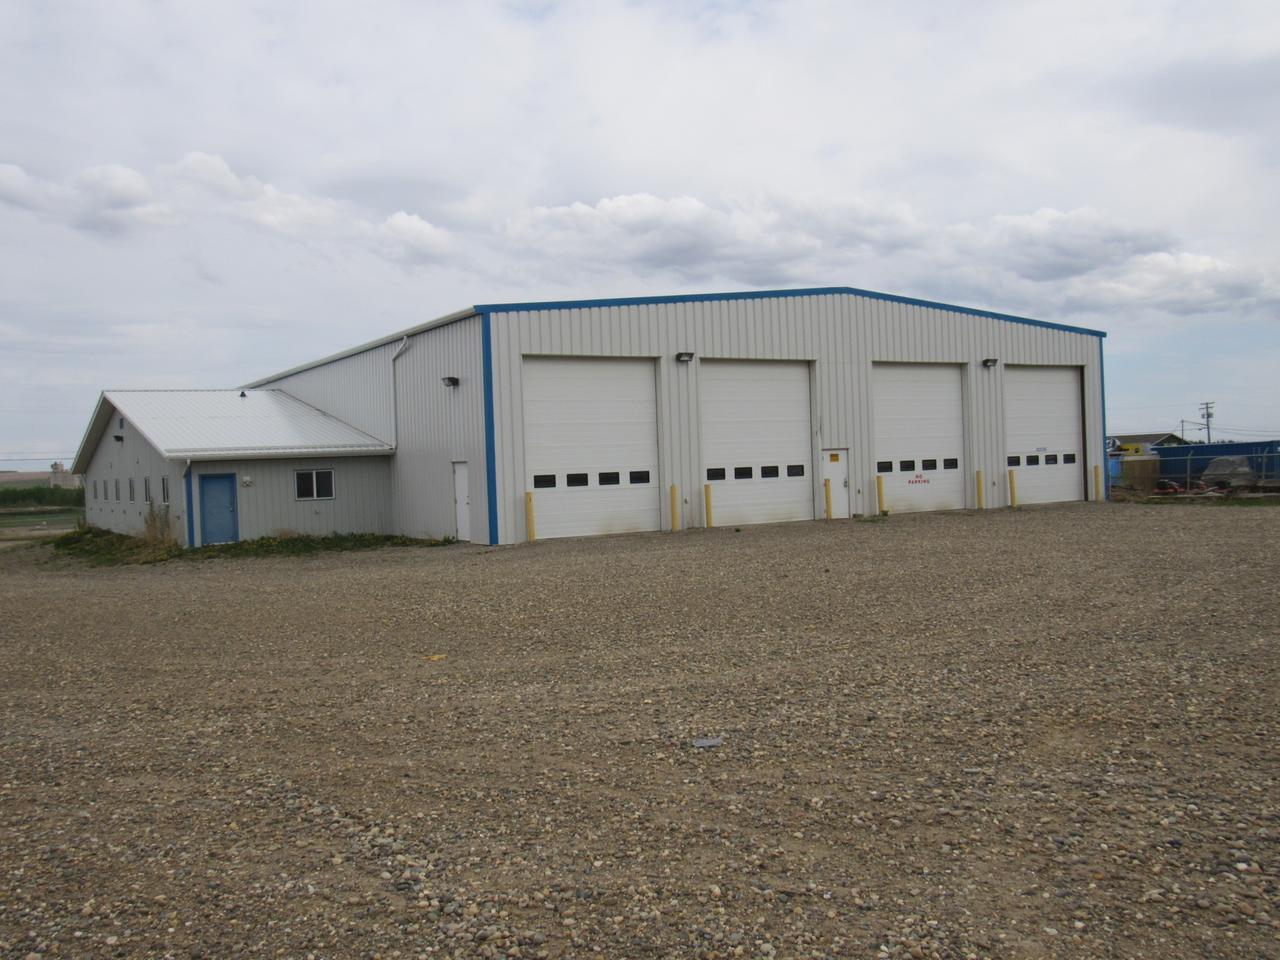 49 Vic Turner Airport Road,, Dawson Creek, British Columbia  V1G 0G1 - Photo 2 - 174778